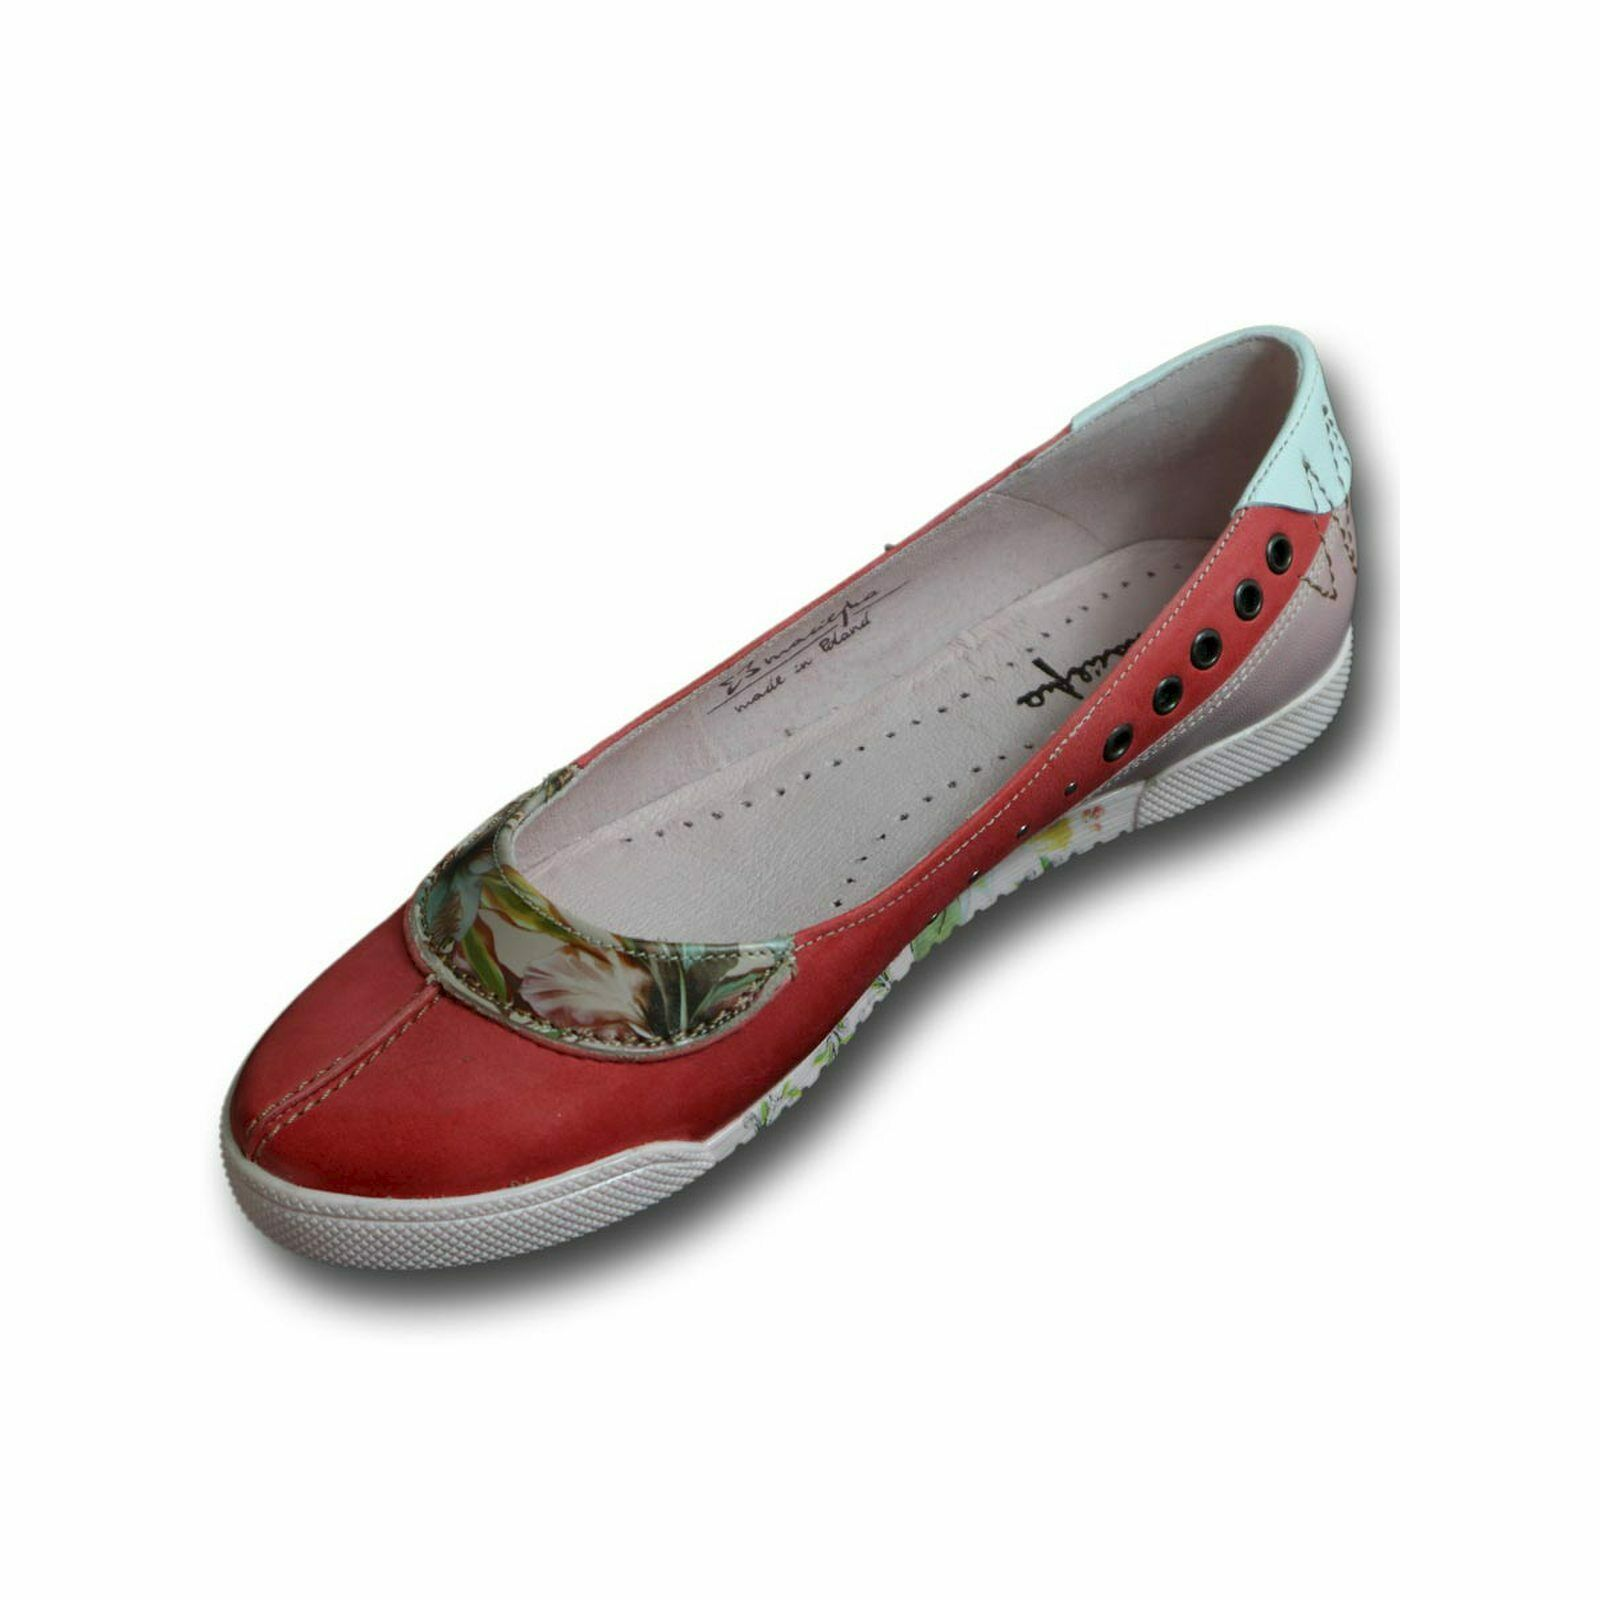 Bailarina para donna MACIEJKA, rosso, estampado floral, costuras decorativas